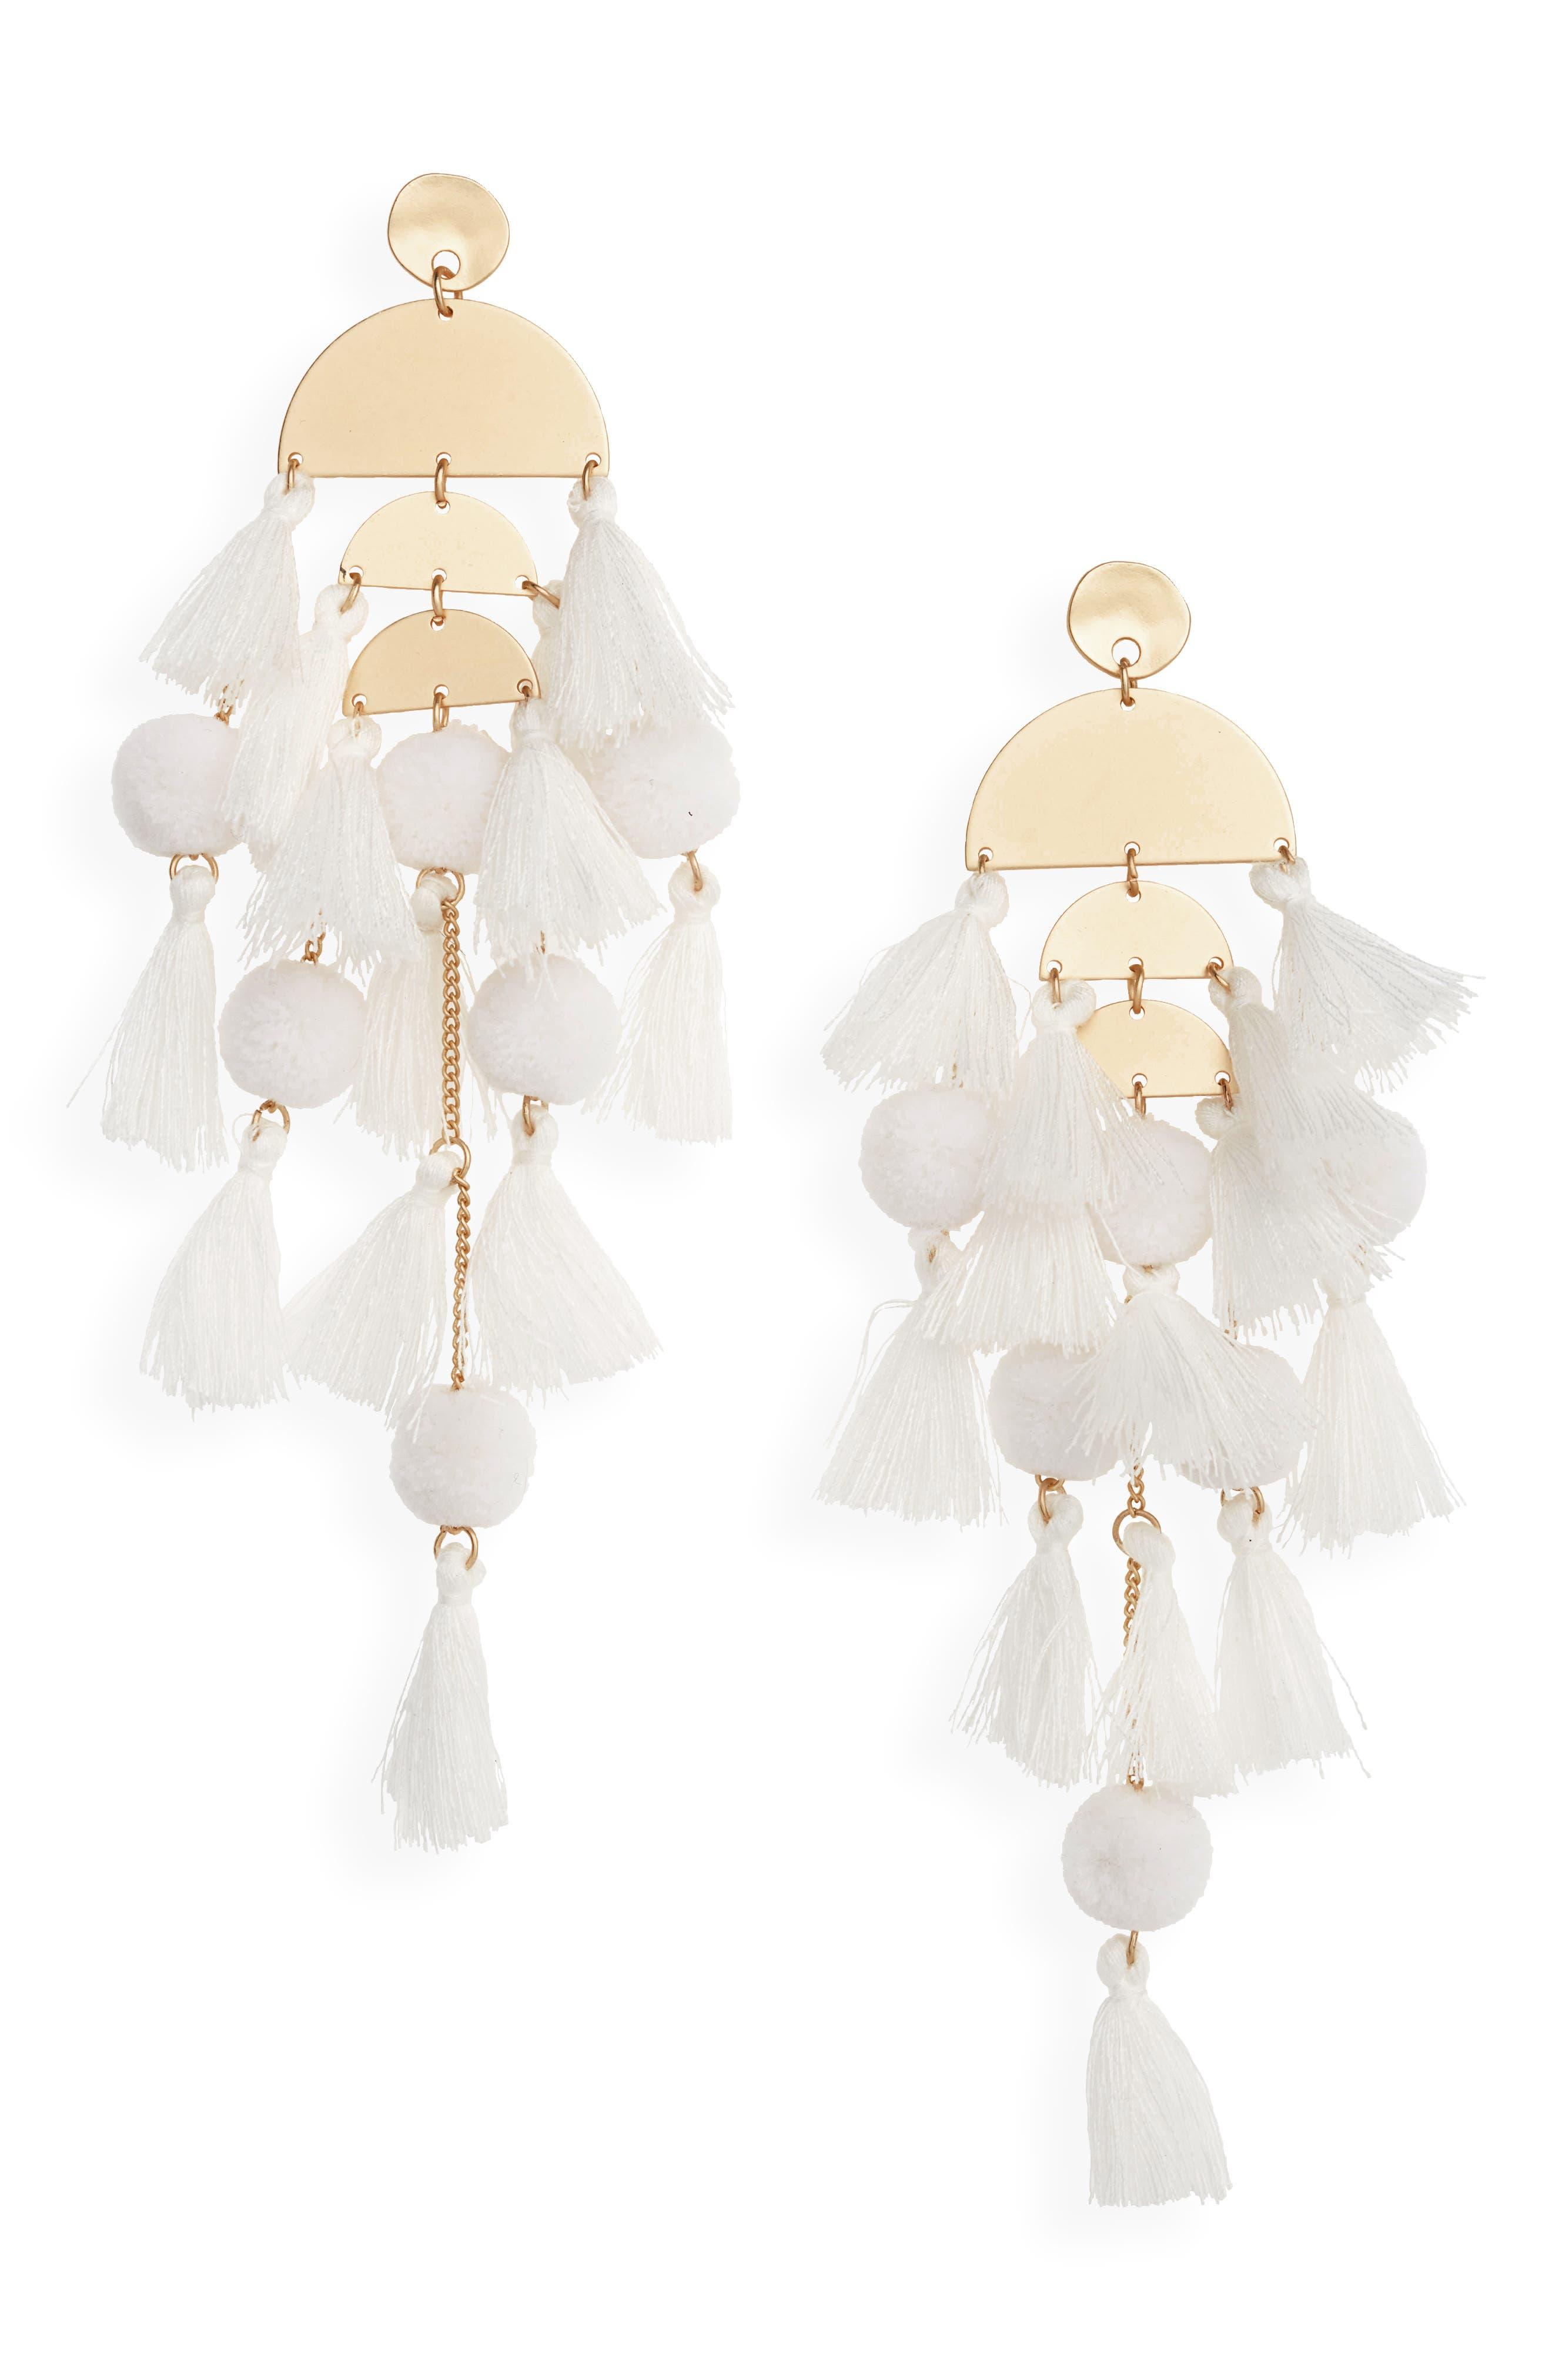 STELLA + RUBY, Calypso Tassel Earrings, Main thumbnail 1, color, GOLD/ WHITE